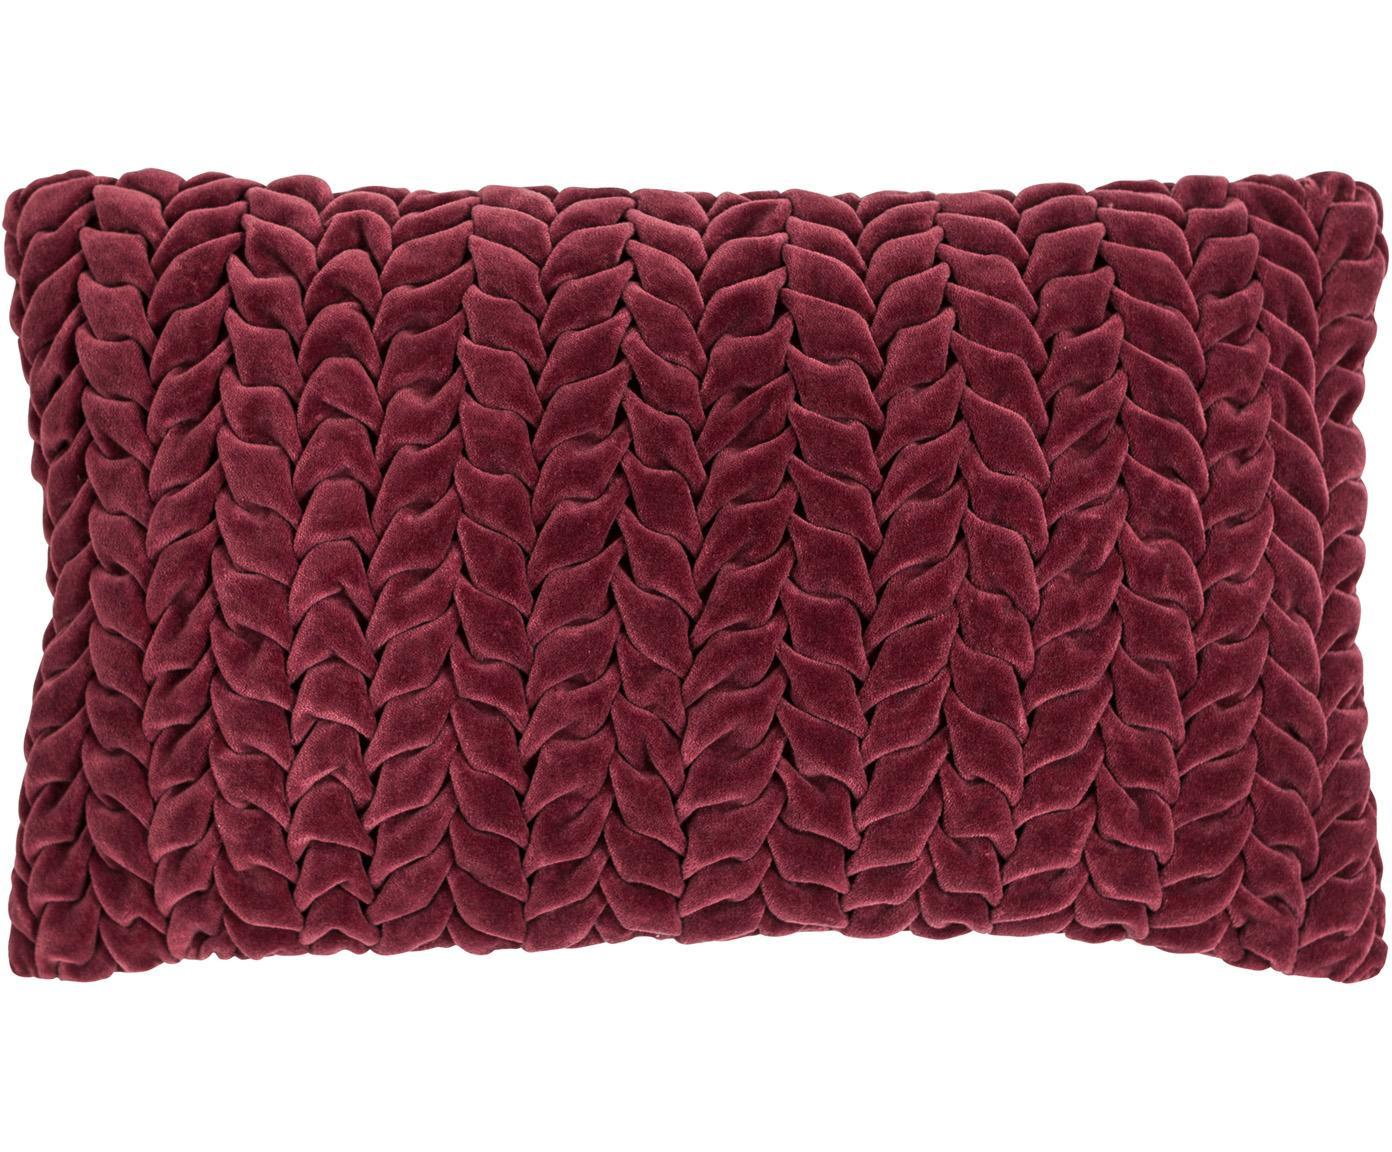 Fluwelen kussen Smock met geribbeld oppervlak, met vulling, Wijnrood, 30 x 50 cm